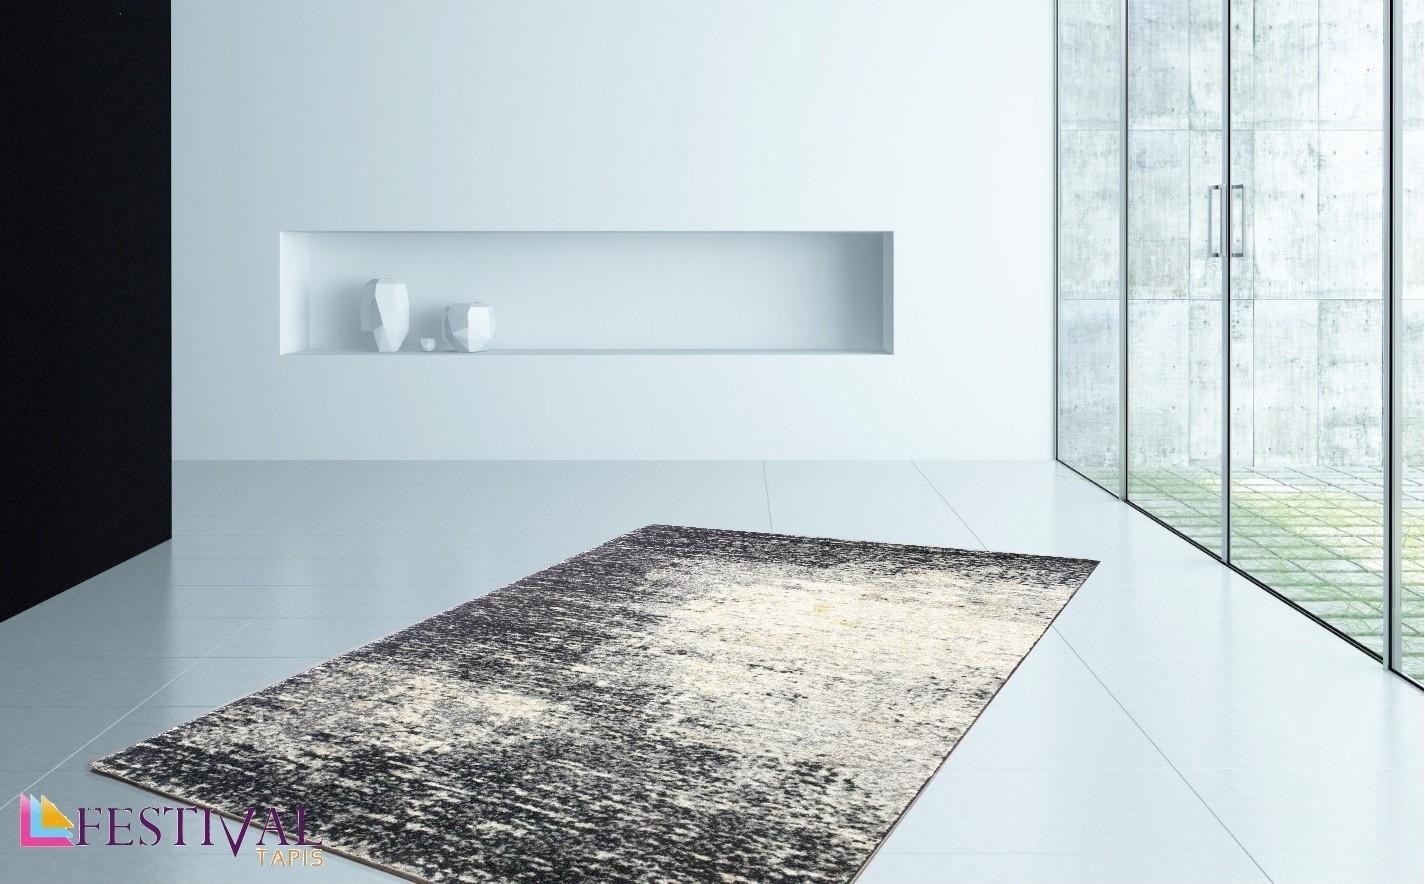 Tapis designer tisse plat decoratif 100 polypropylene for Tapis modernes italiens